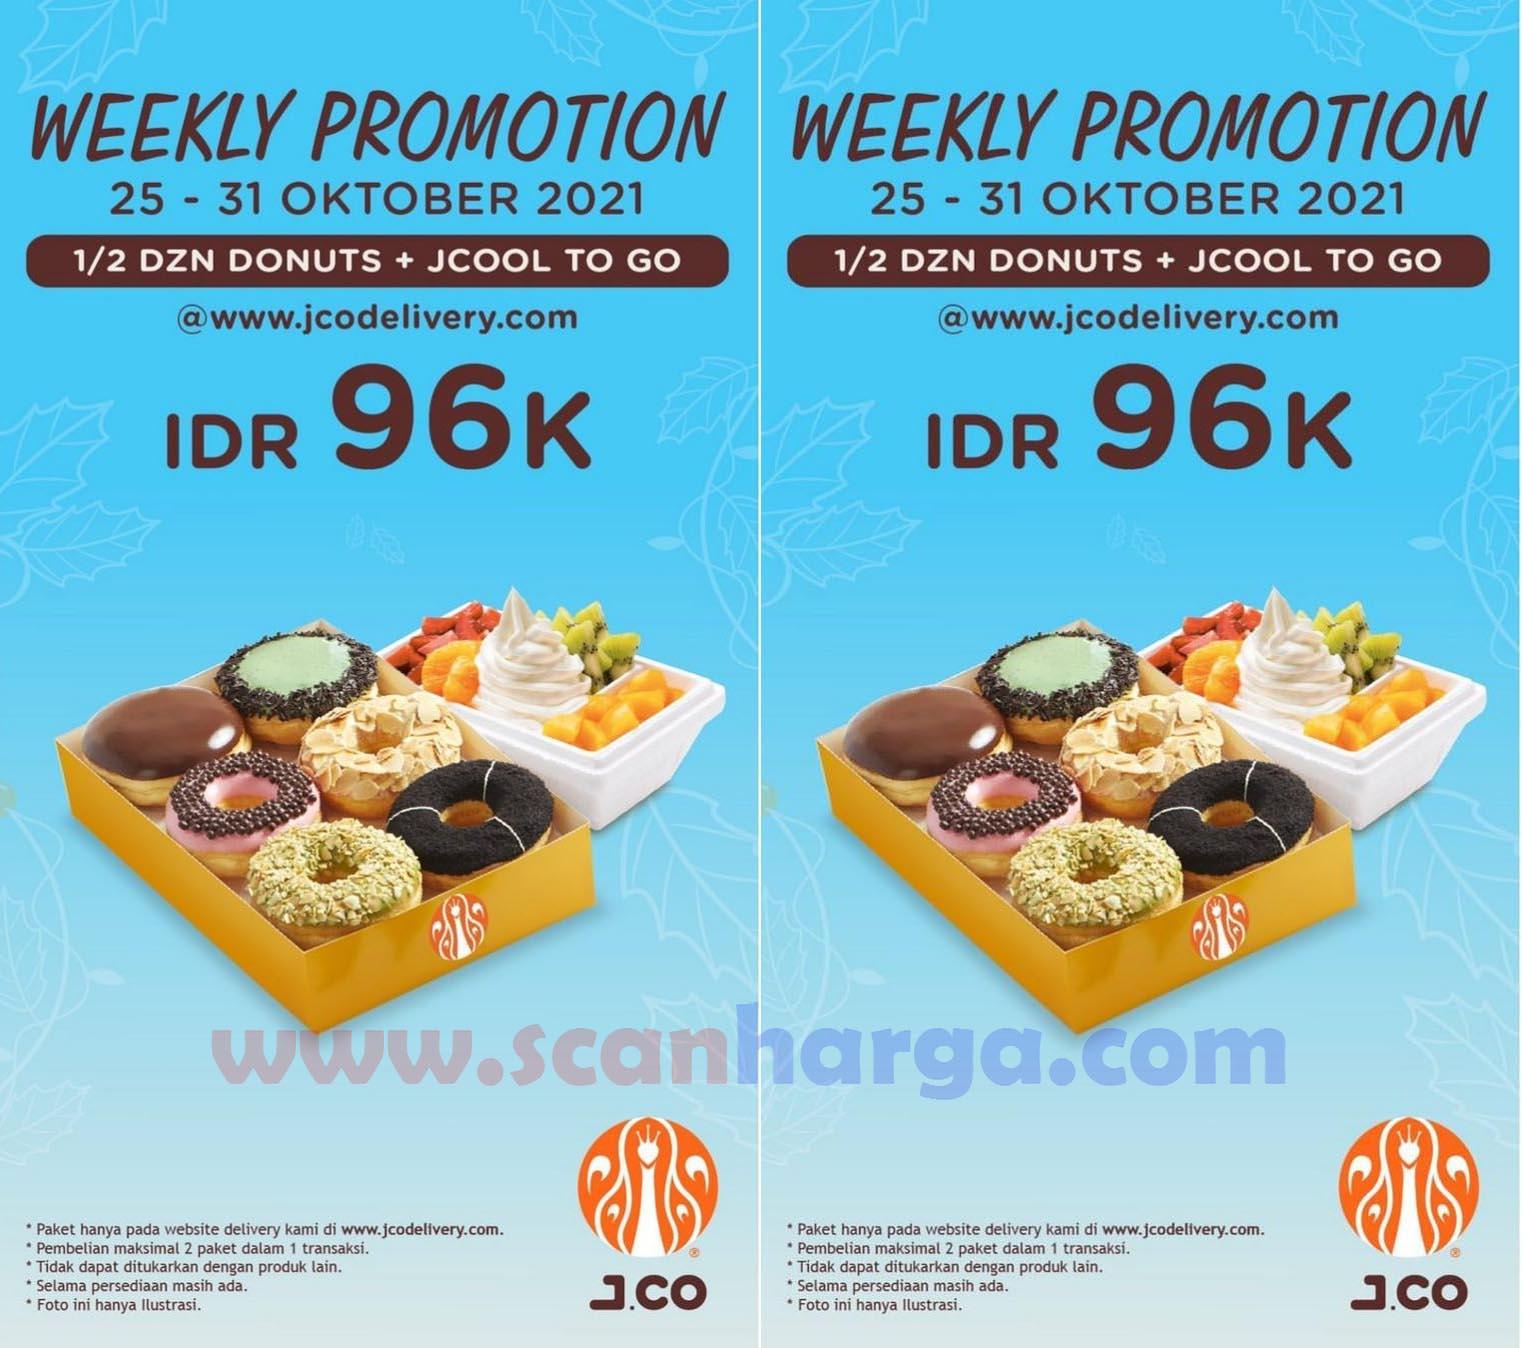 Promo JCO Weekly Promotion Terbaru 25 - 31 Oktober 2021